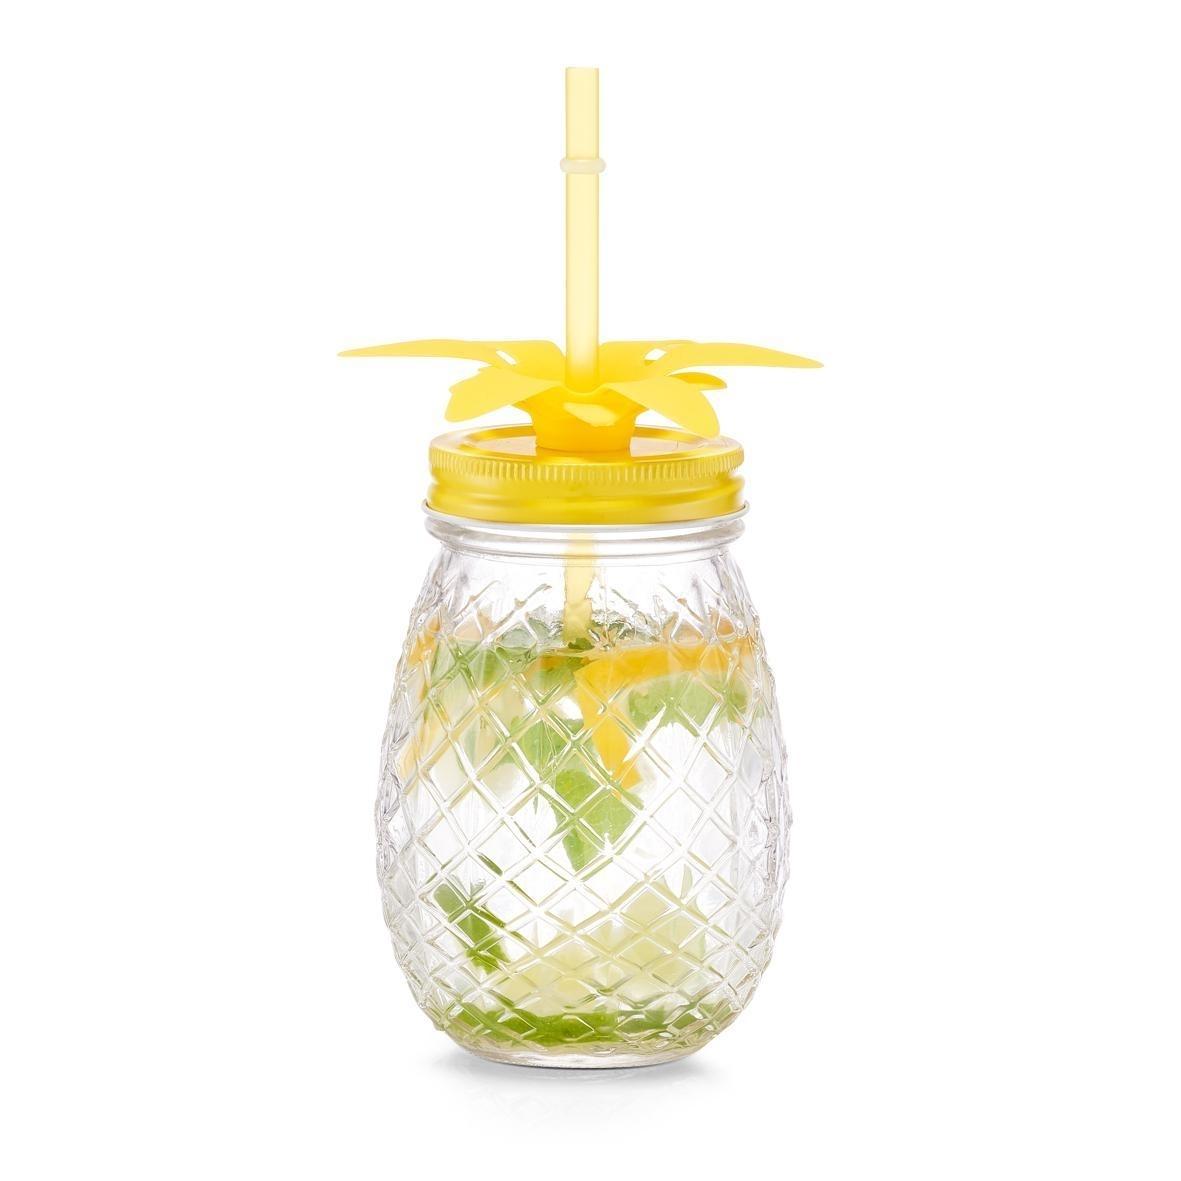 Pahar pentru limonada din sticla, capac si pai, Pineapple Galben, 500 ml, Ø9,5xH14,5 cm